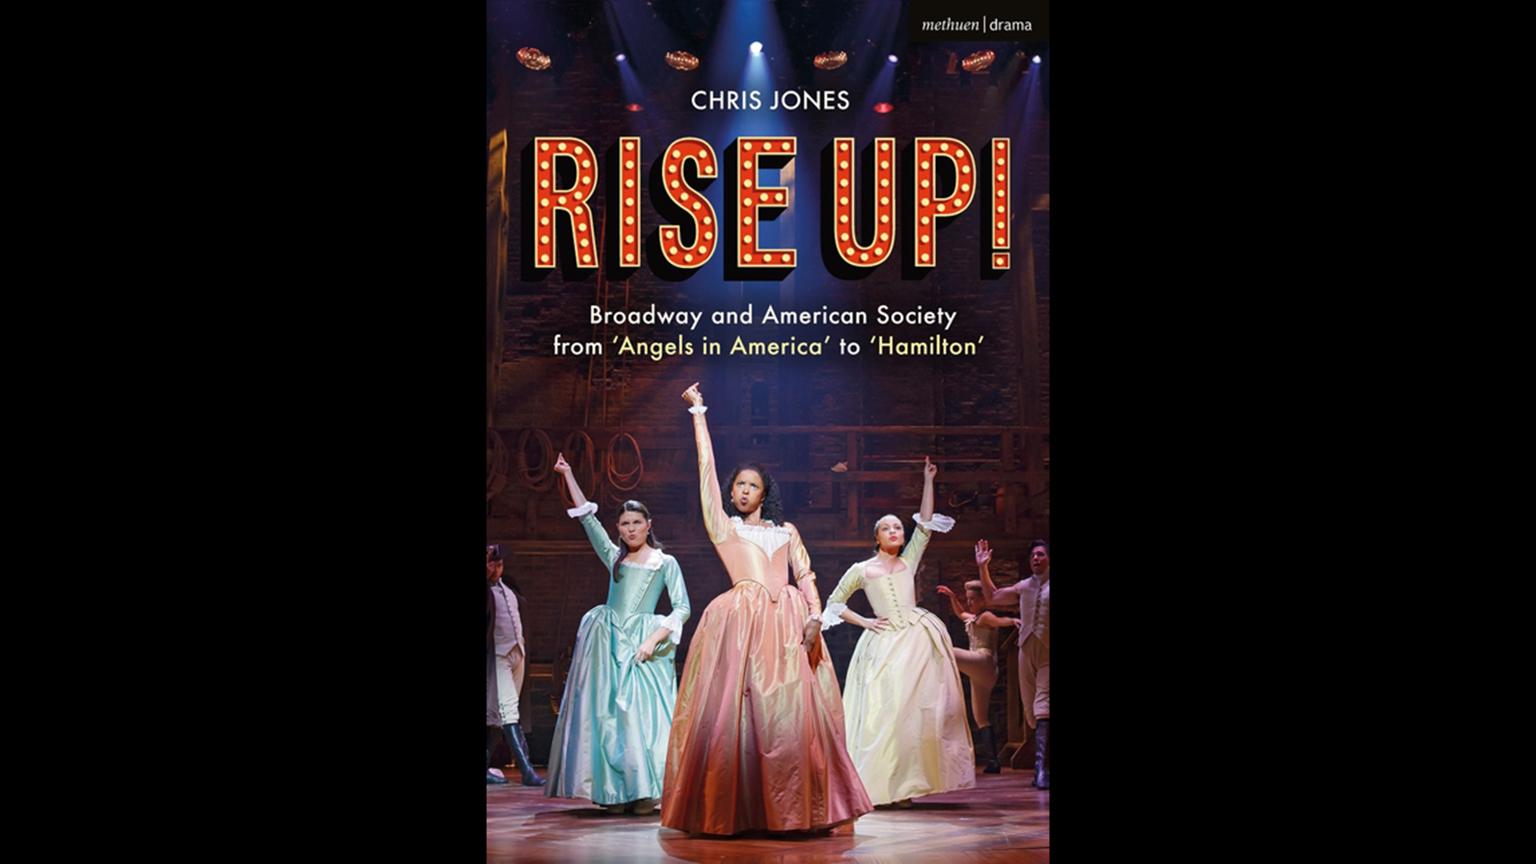 Chris Jones' Book 'Rise Up!' Examines Contemporary American Theater